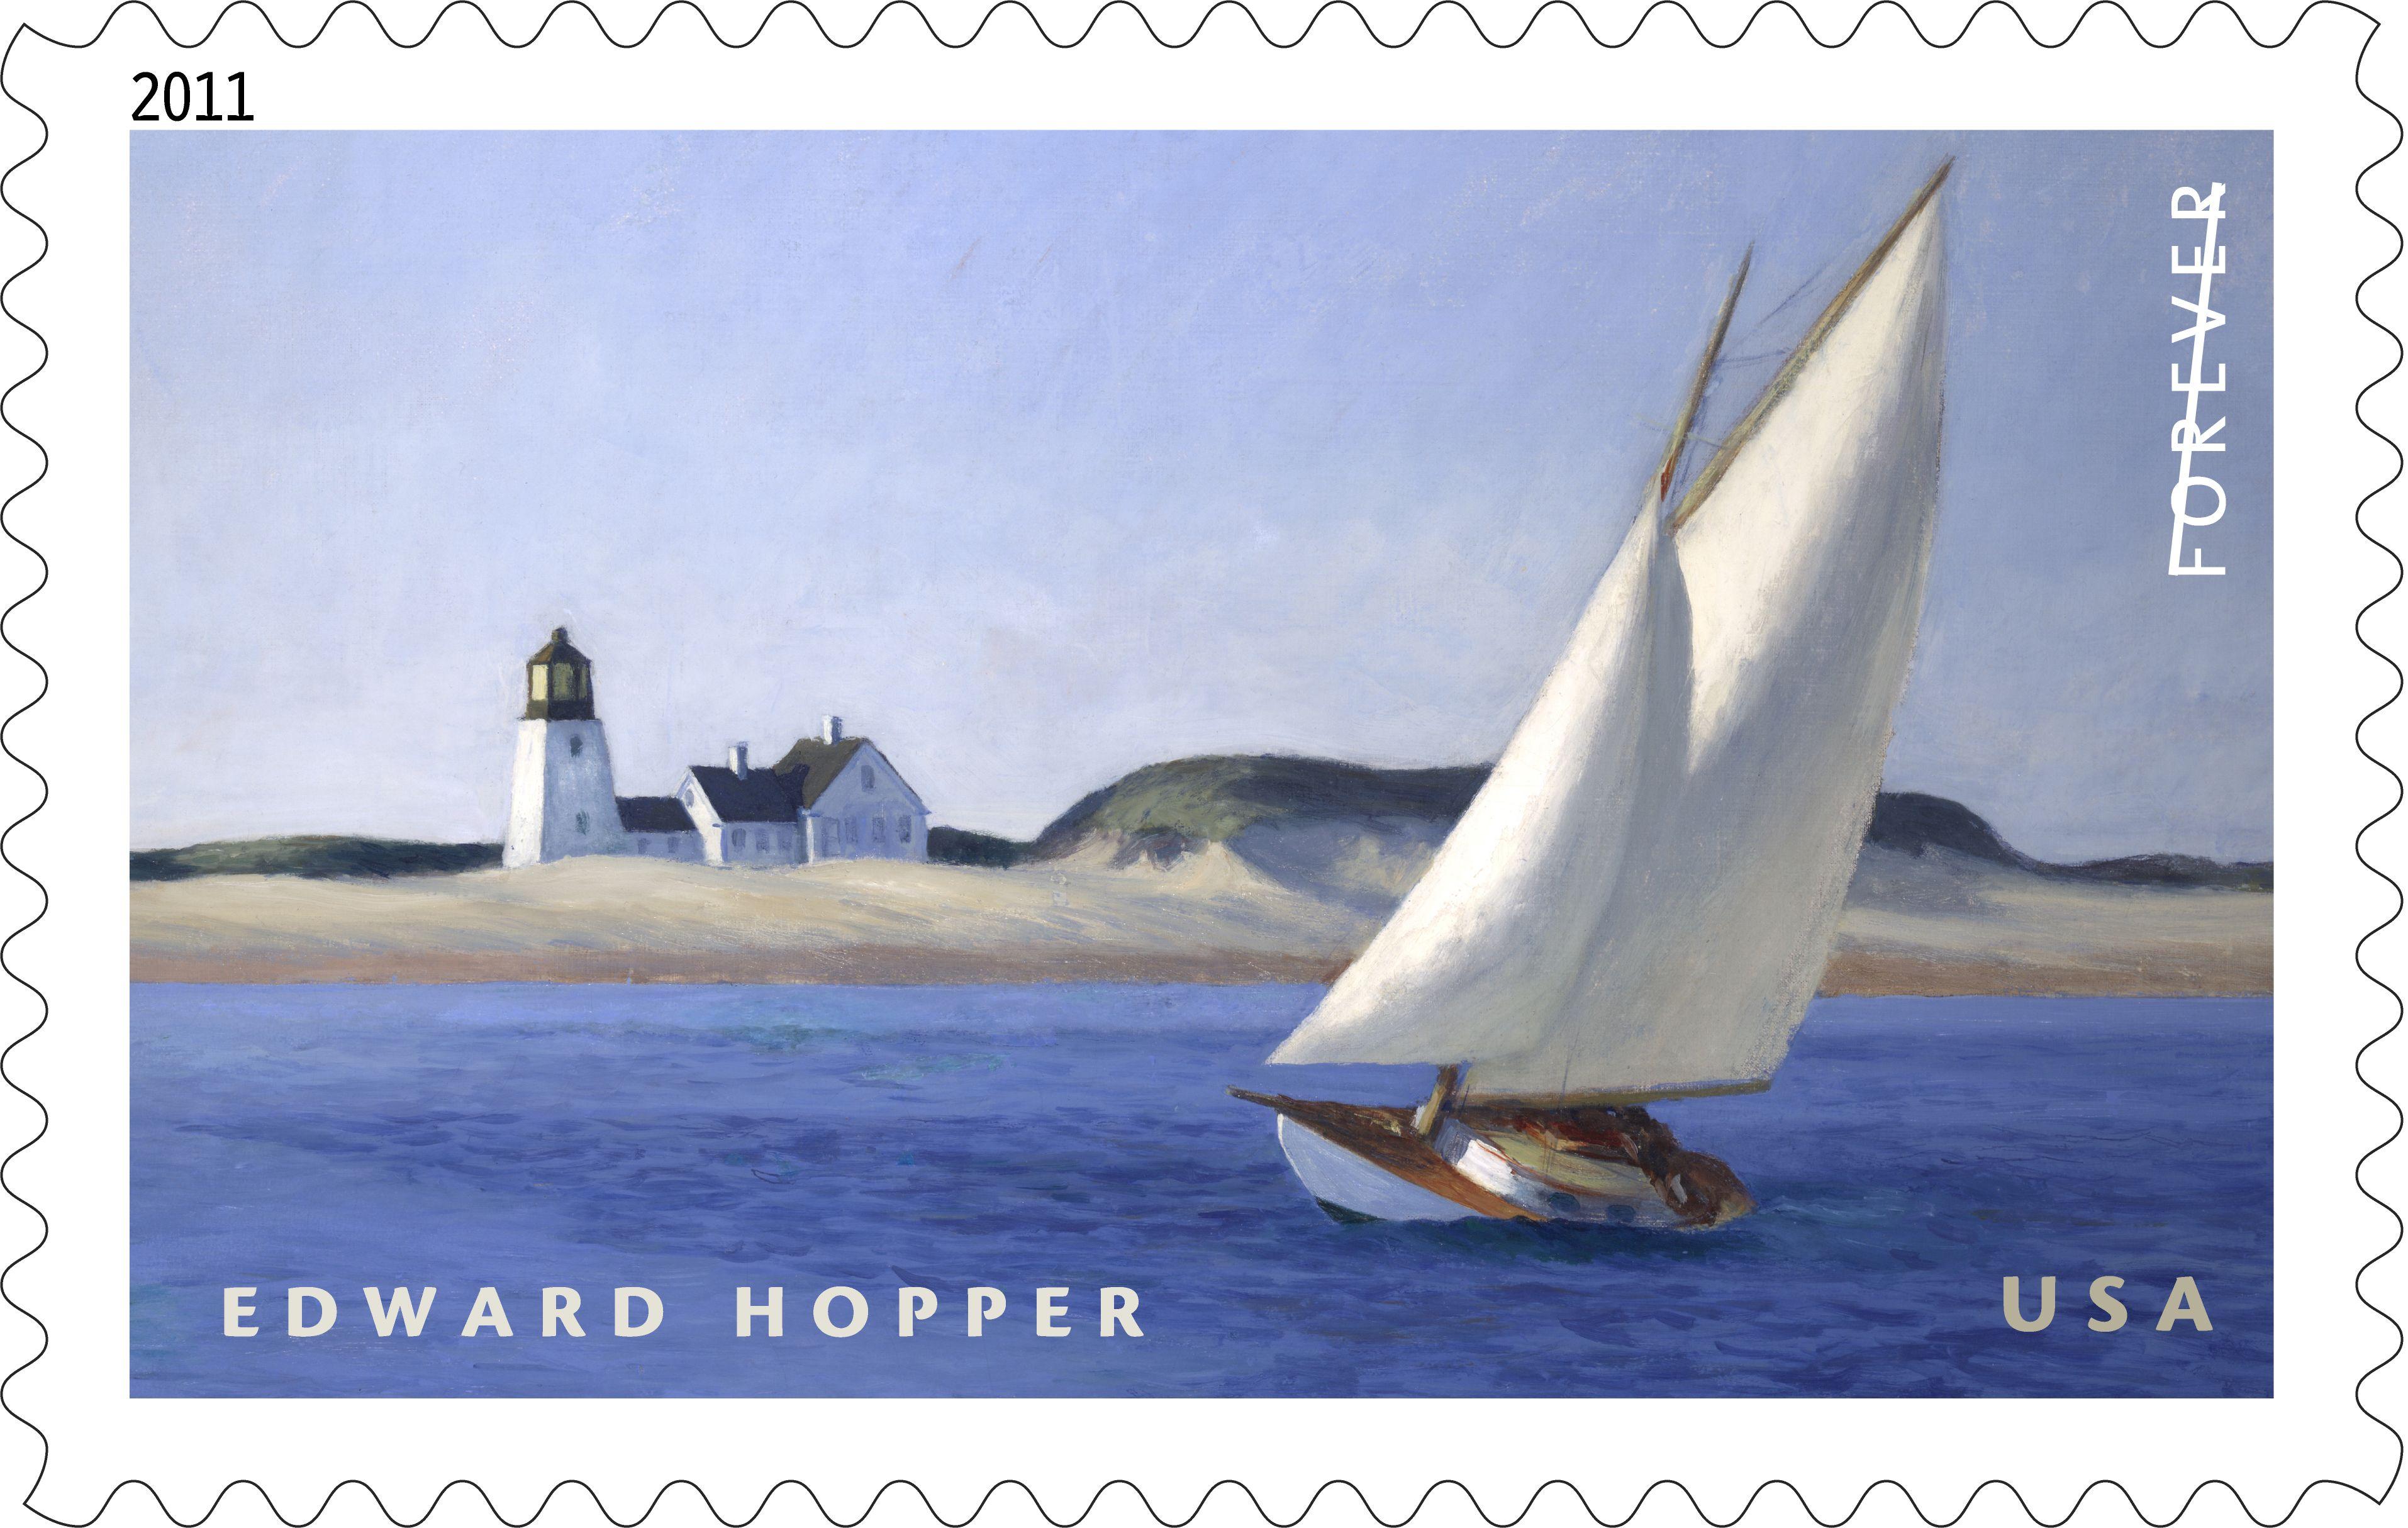 USA Stamp: Edward Hopper, 2011